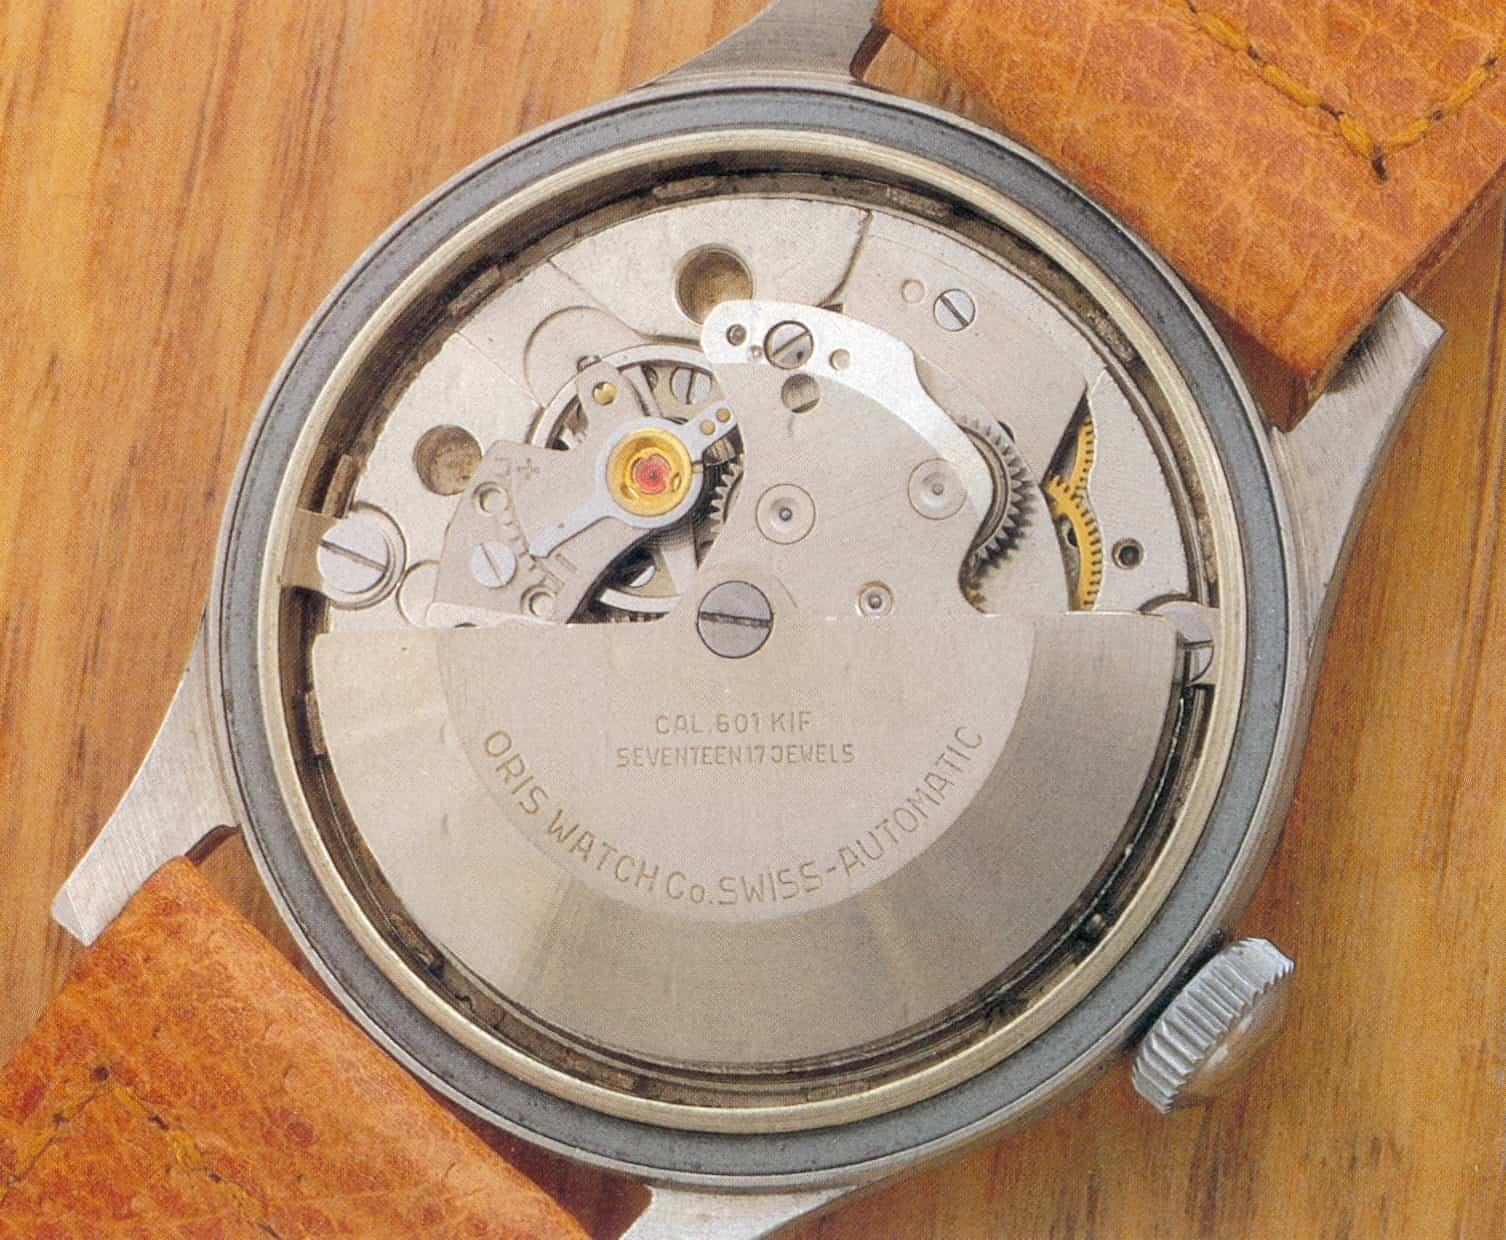 Oris Automatic Stiftanker Gangreserveanzeige 1952-1953 Kaliber 601-605